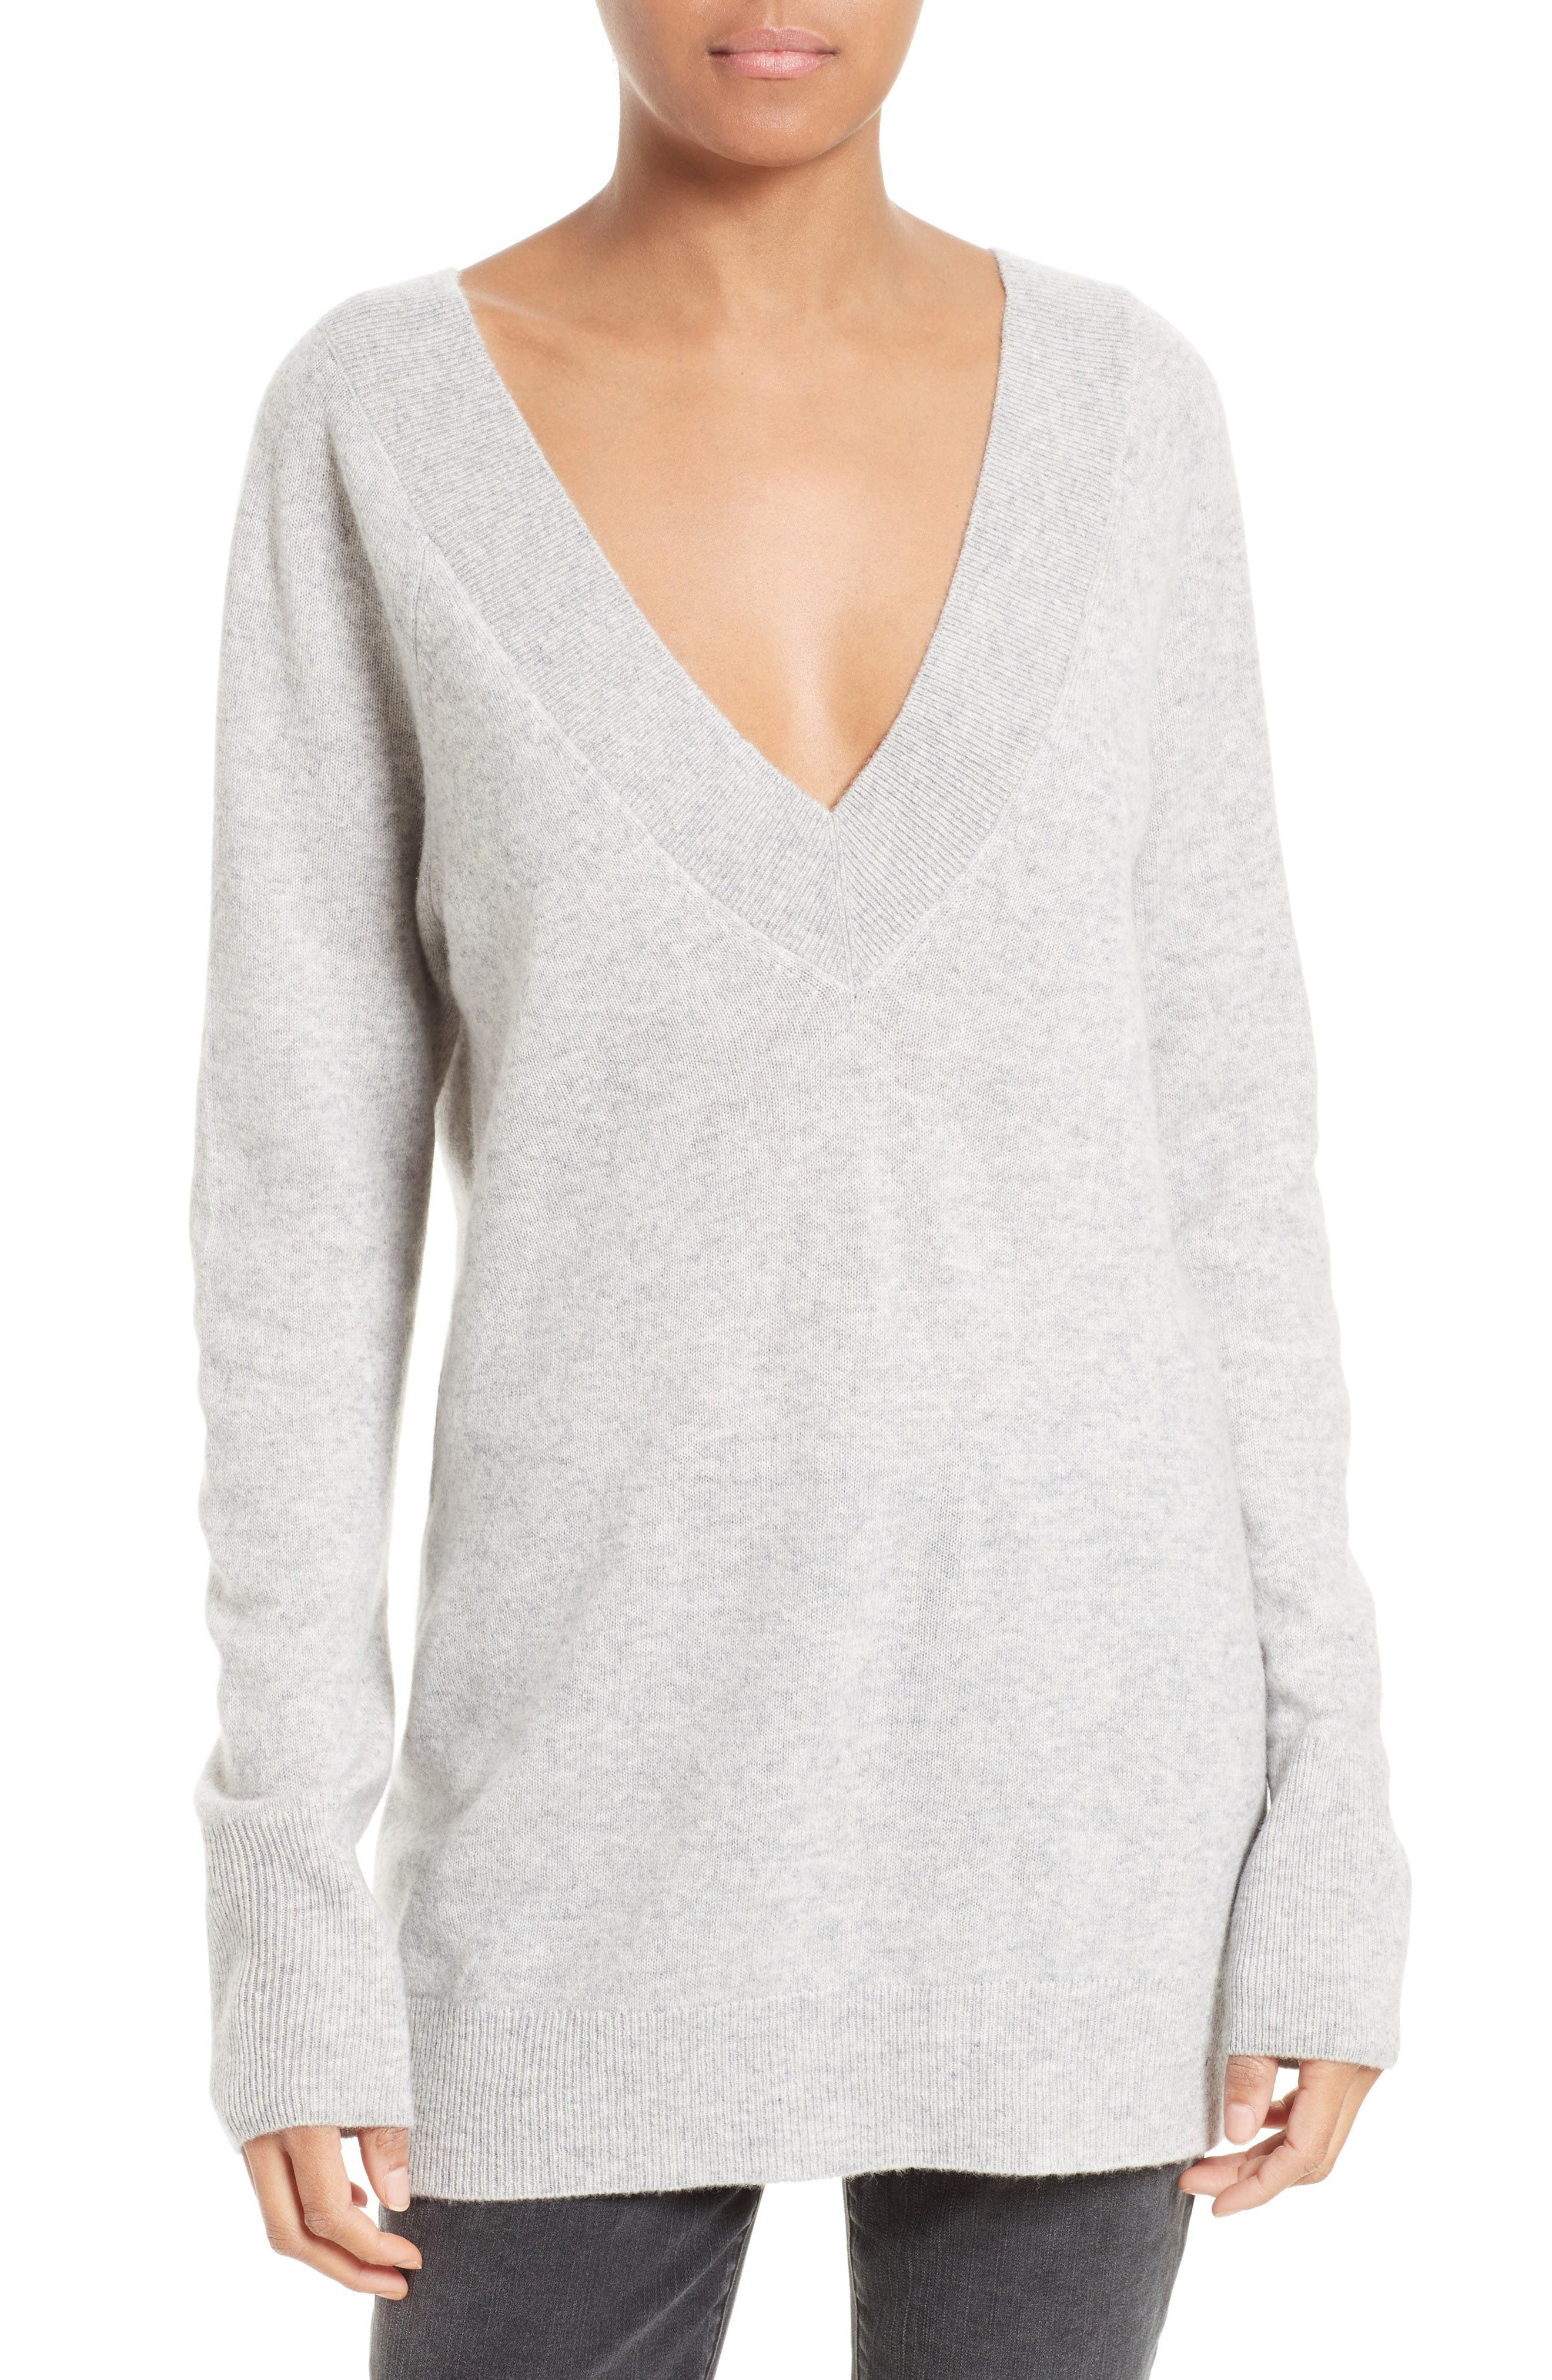 Equipment Linden Cashmere Sweater